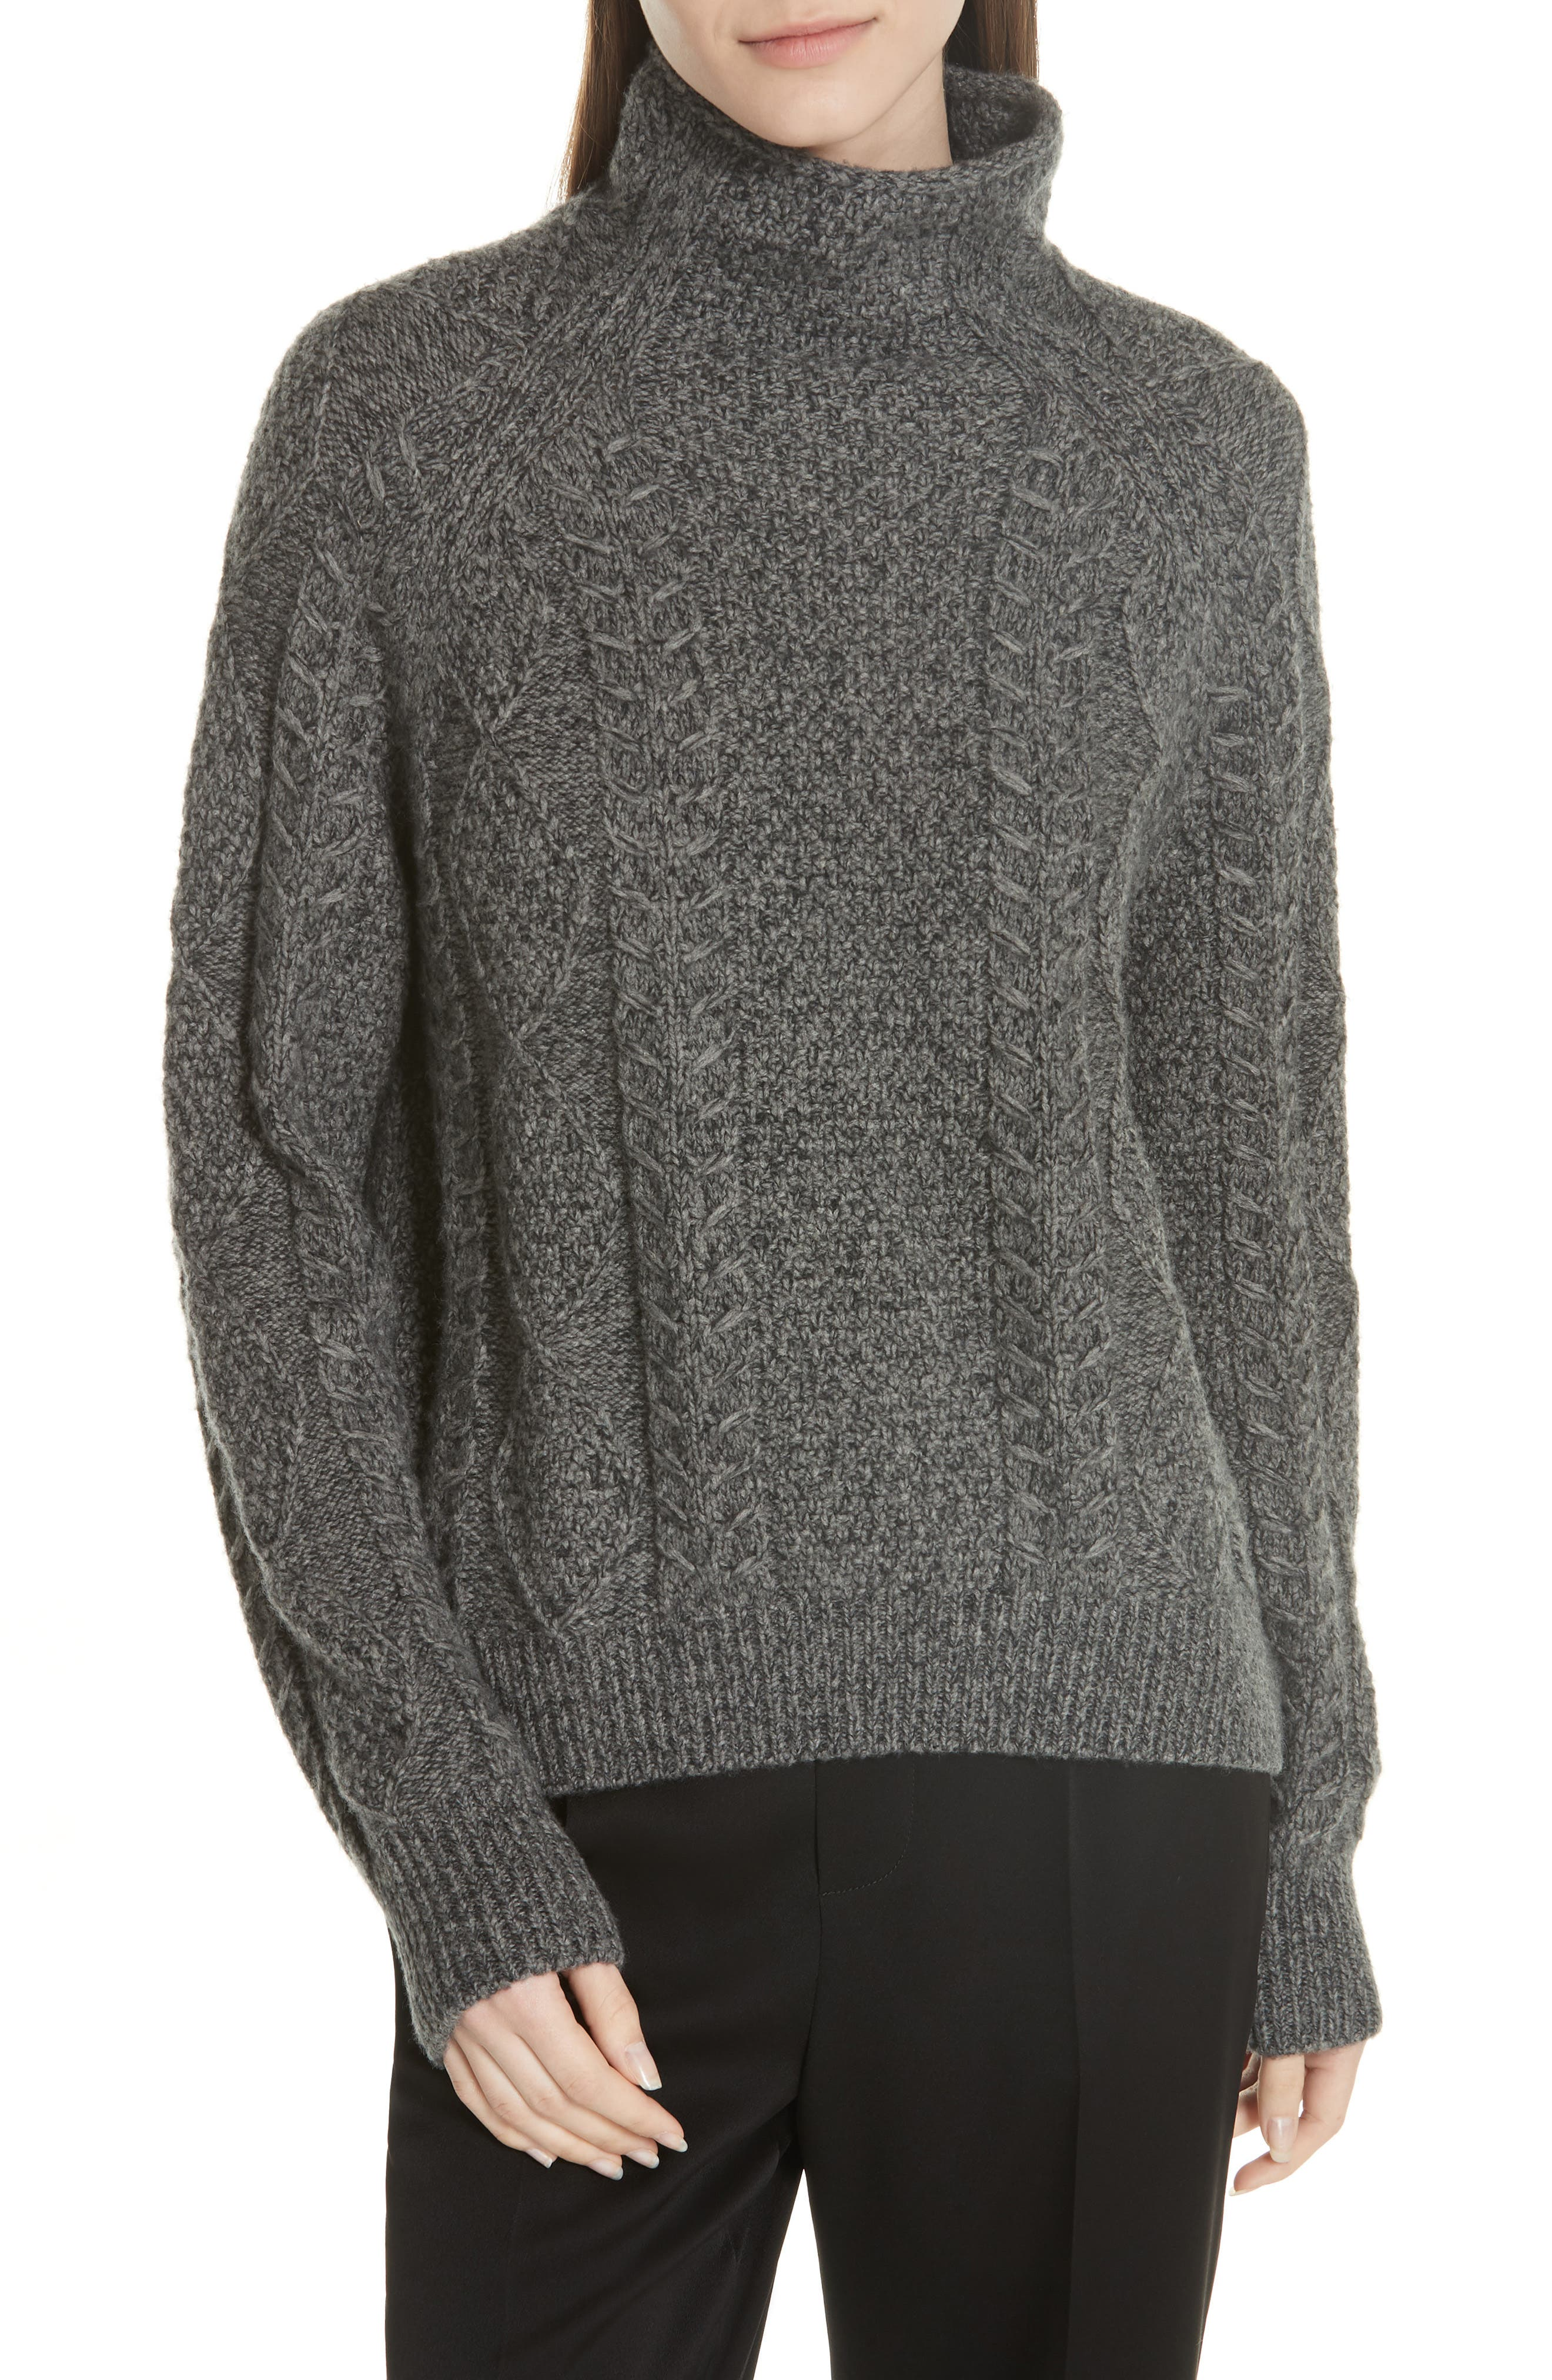 Cable Turtleneck Sweater,                         Main,                         color, HEATHER STONE/ HEATHER CARBON